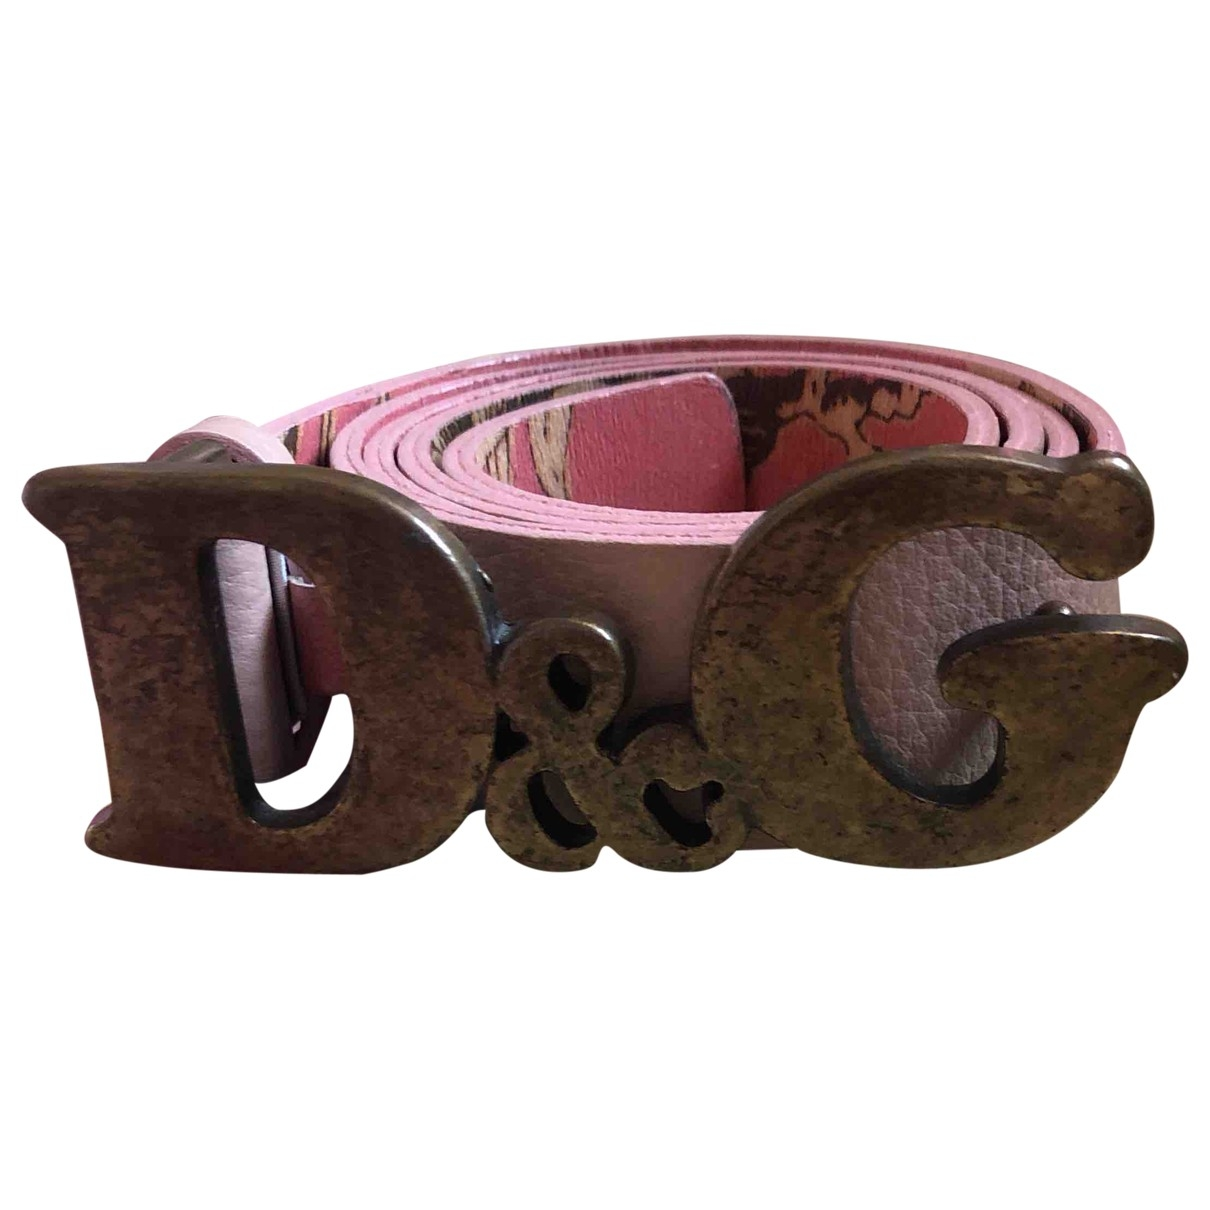 Dolce & Gabbana \N Pink Leather belt for Women S International